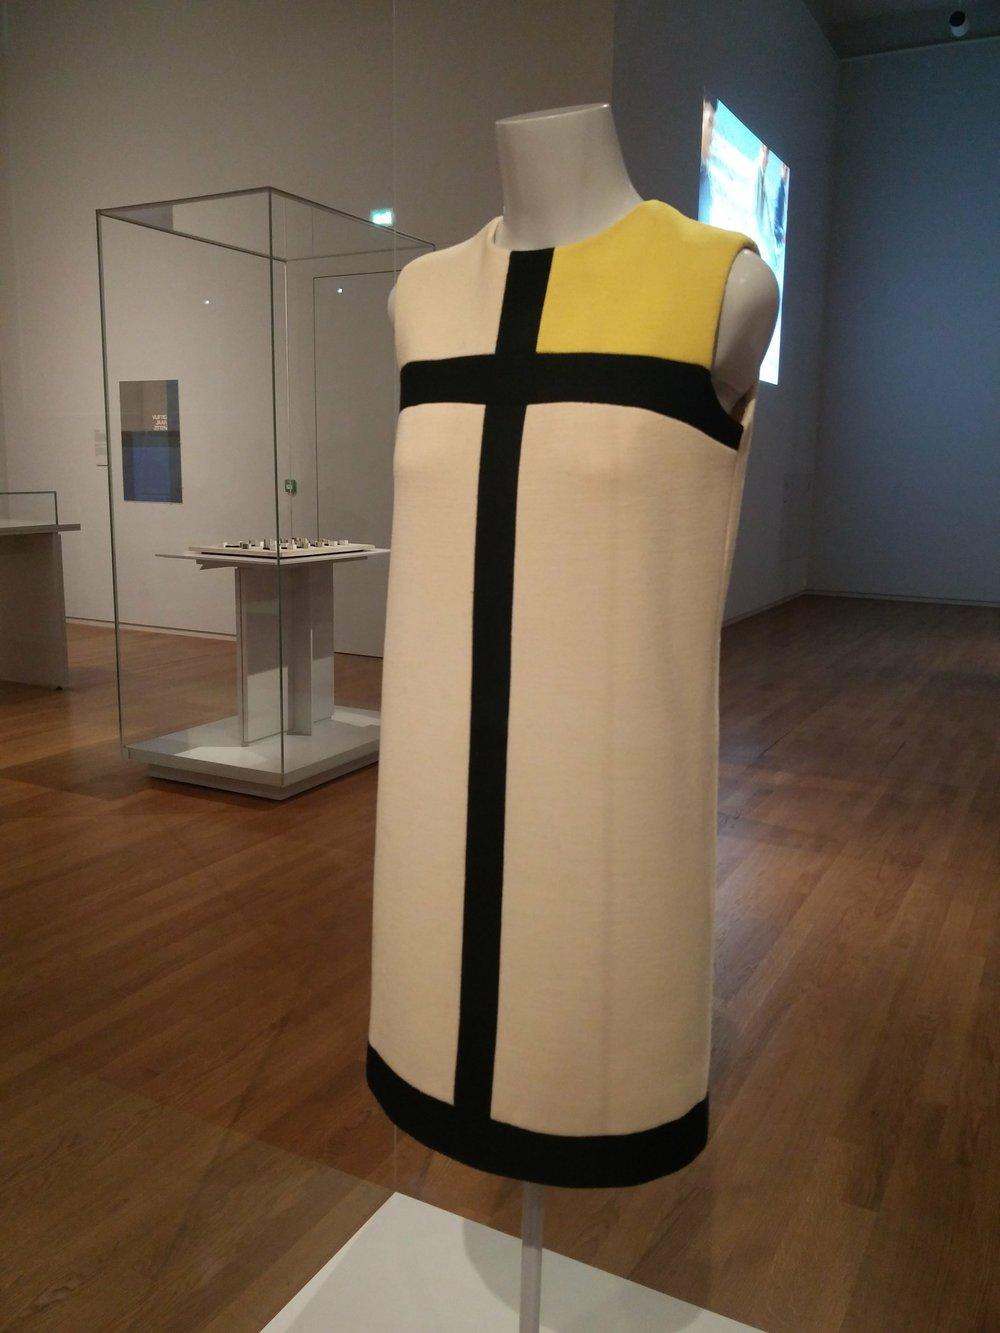 Yves Saint Laurent, Piet Mondrian Collaboration 1965. Rijksmuseum Amsterdam